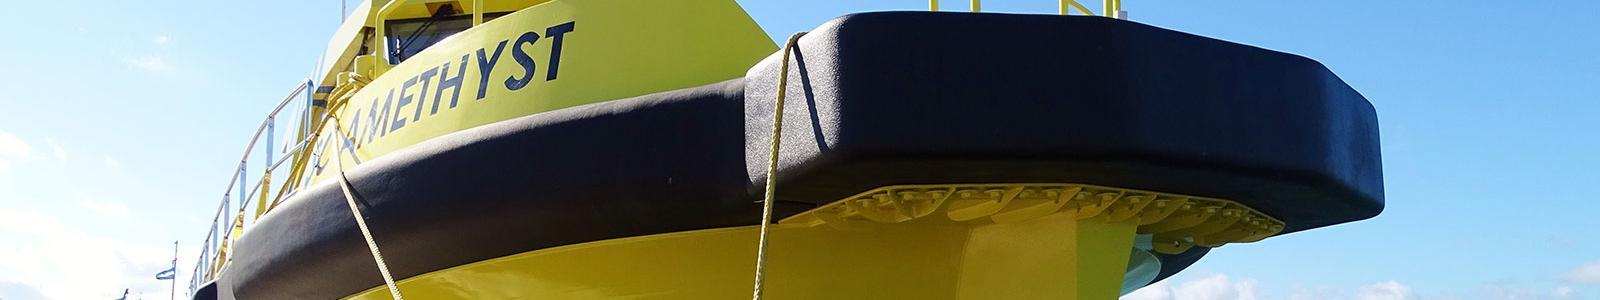 Projects-2013-11-workboats-Sima-Charters-Amethyst-slider.jpg